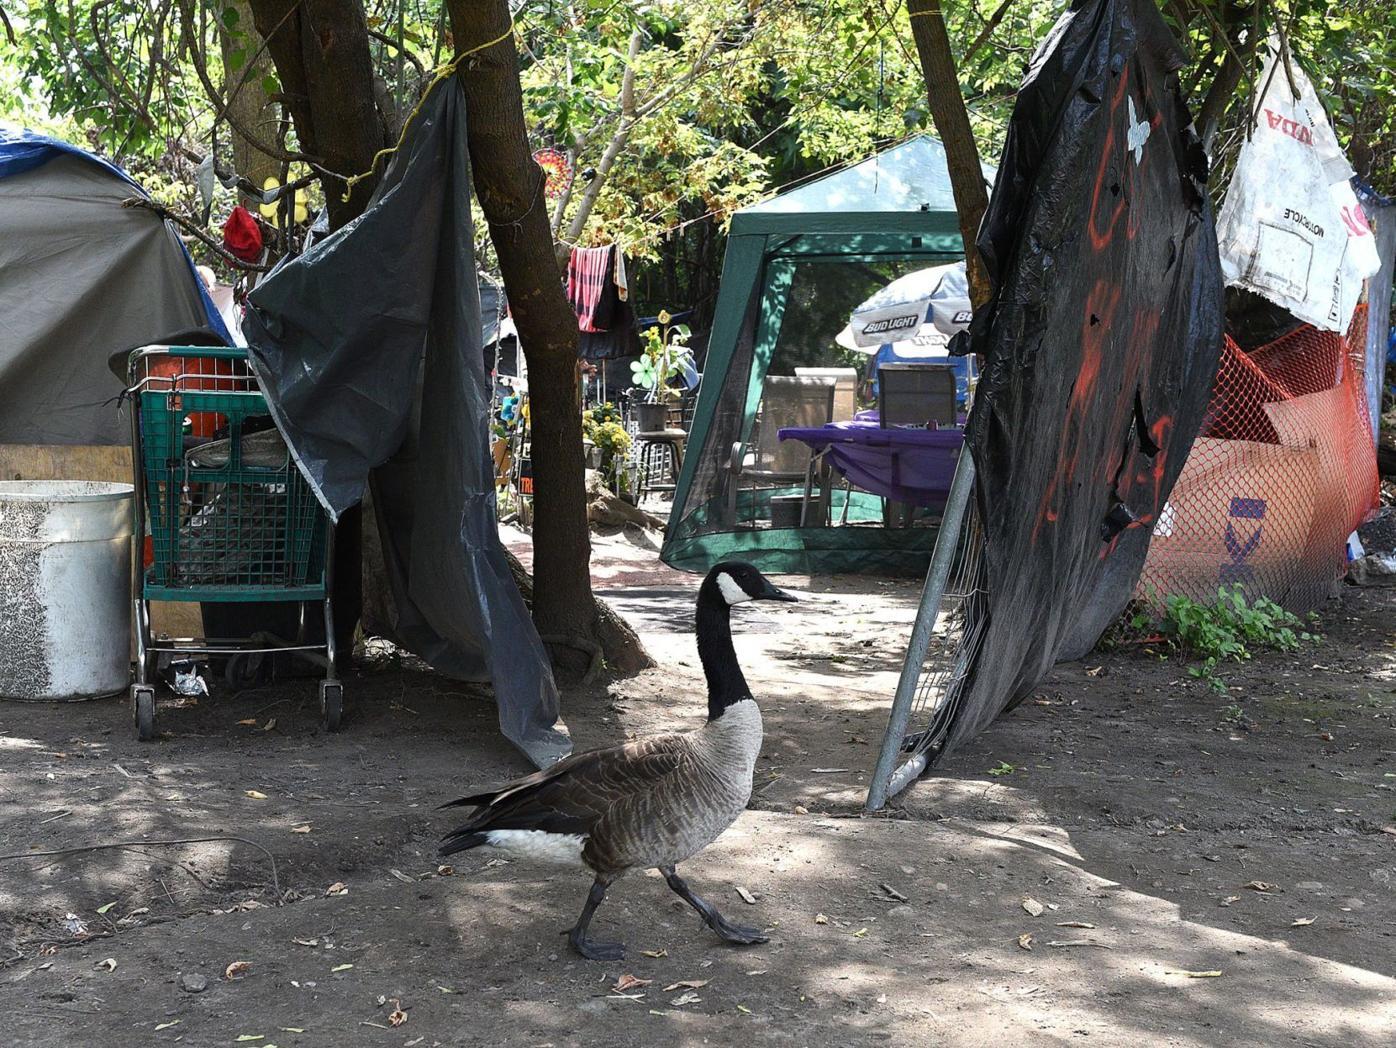 Canada goose patrols camp